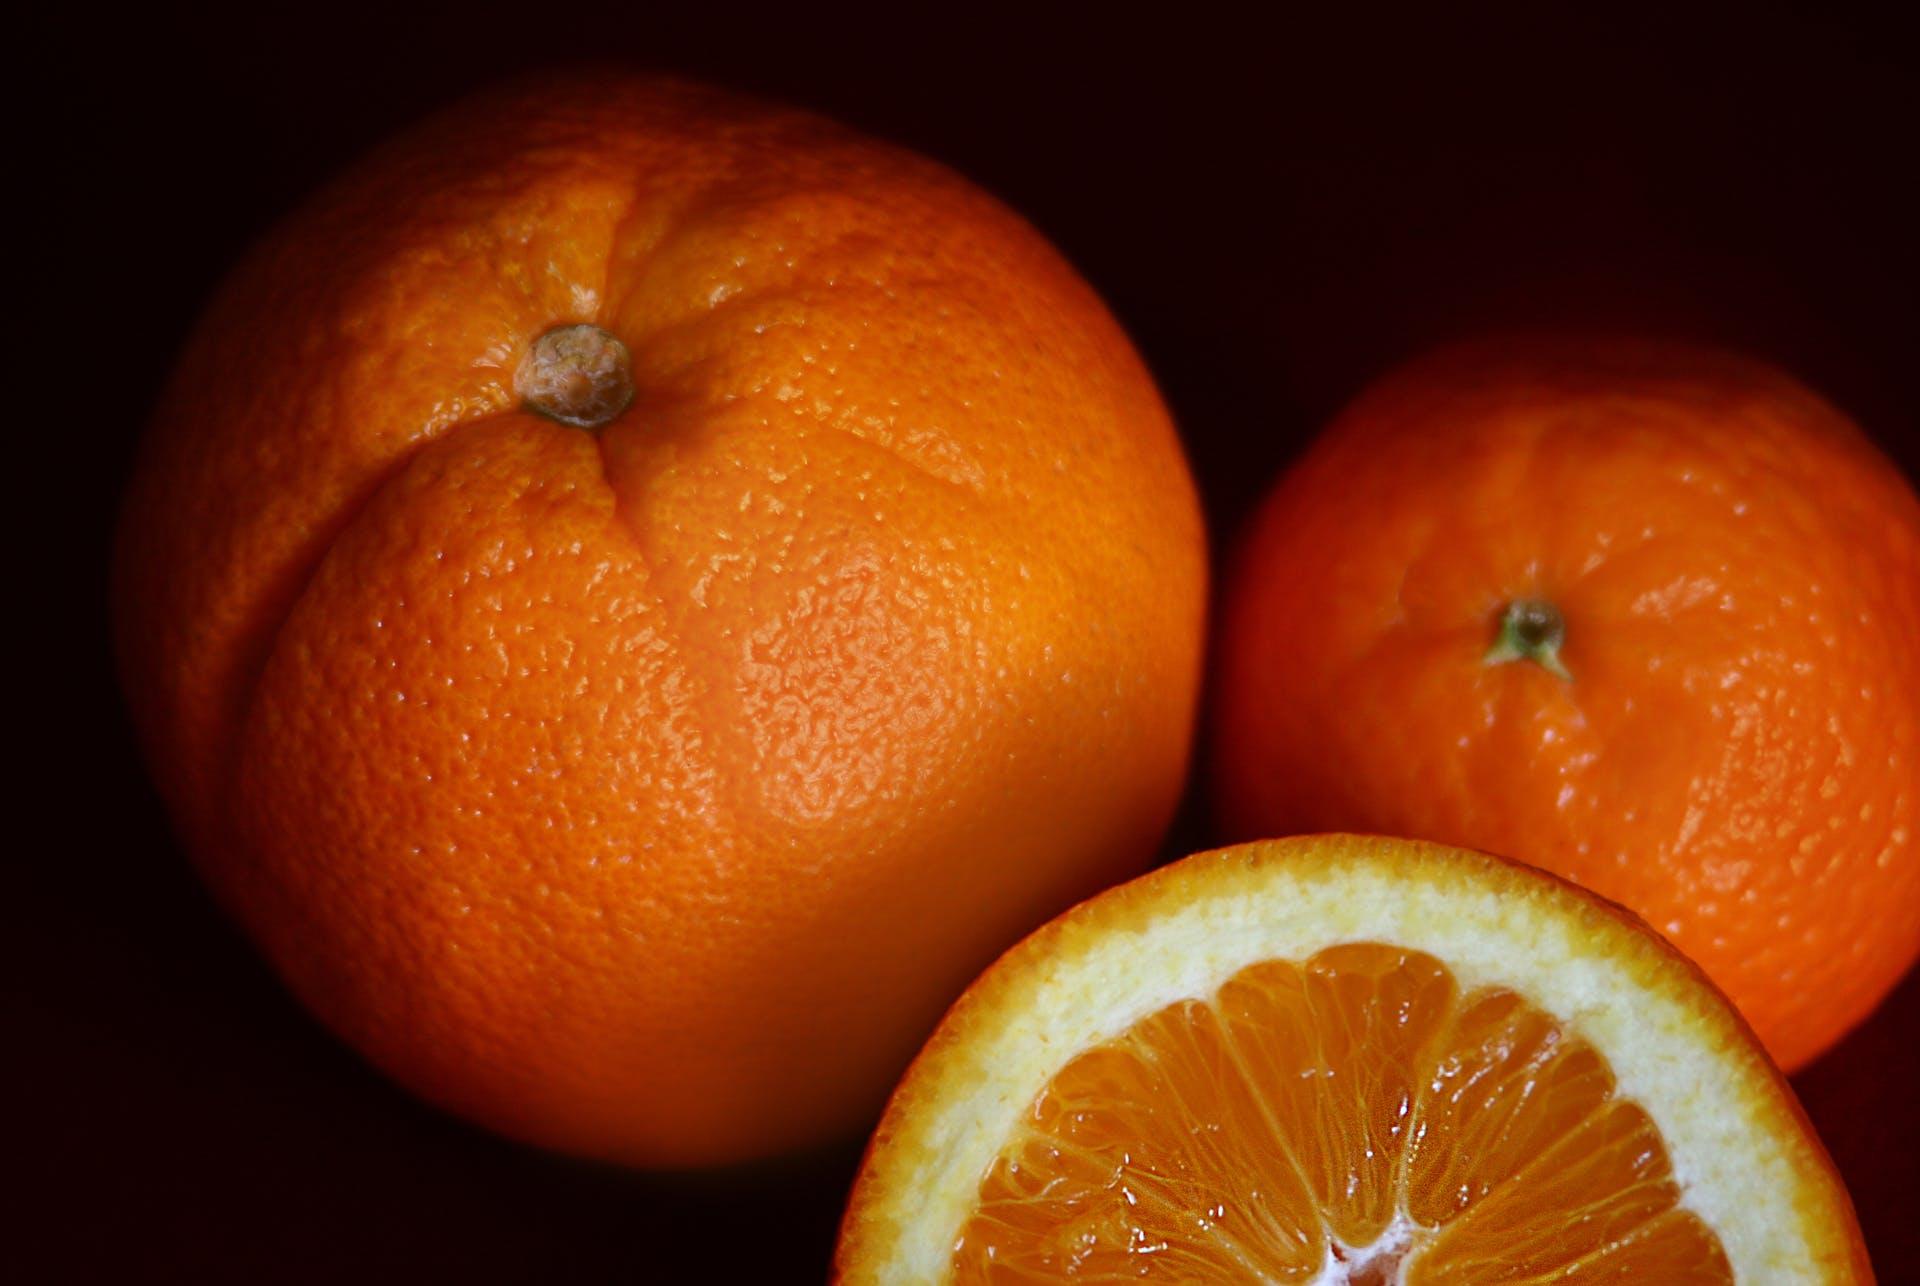 fruit citrus fruit fruit juice oranges